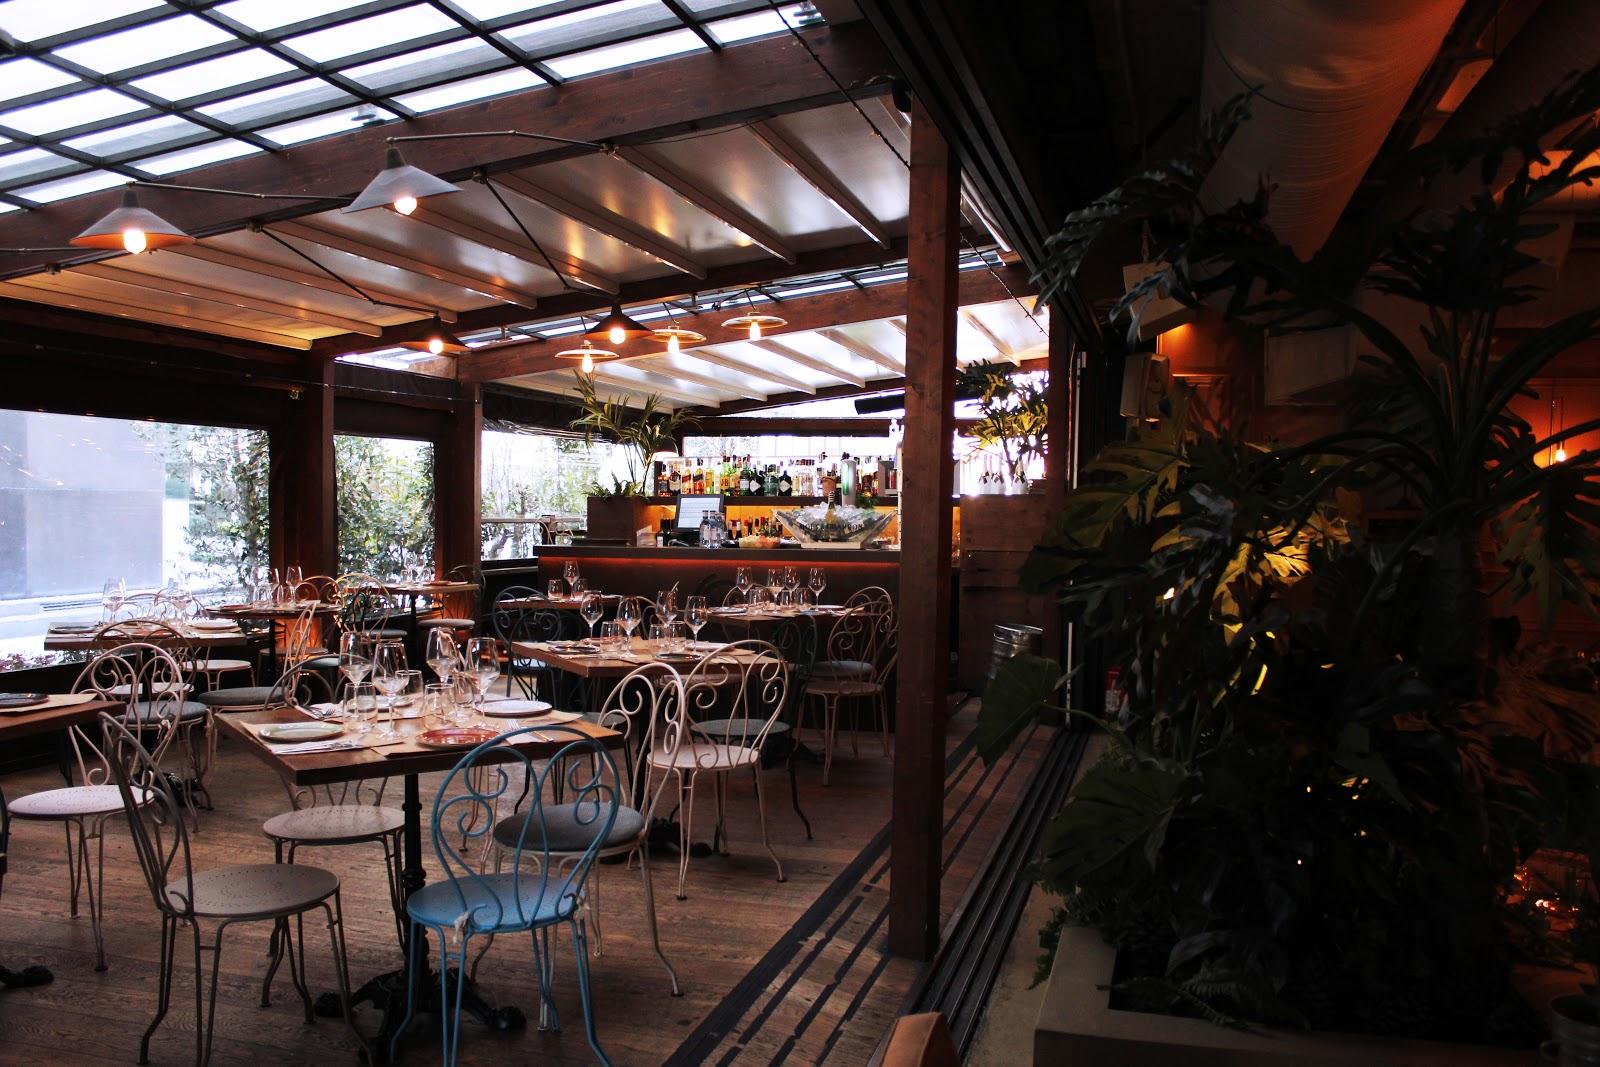 Ltc marieta madrid university lifestye theulifestyle - Marieta restaurante madrid ...